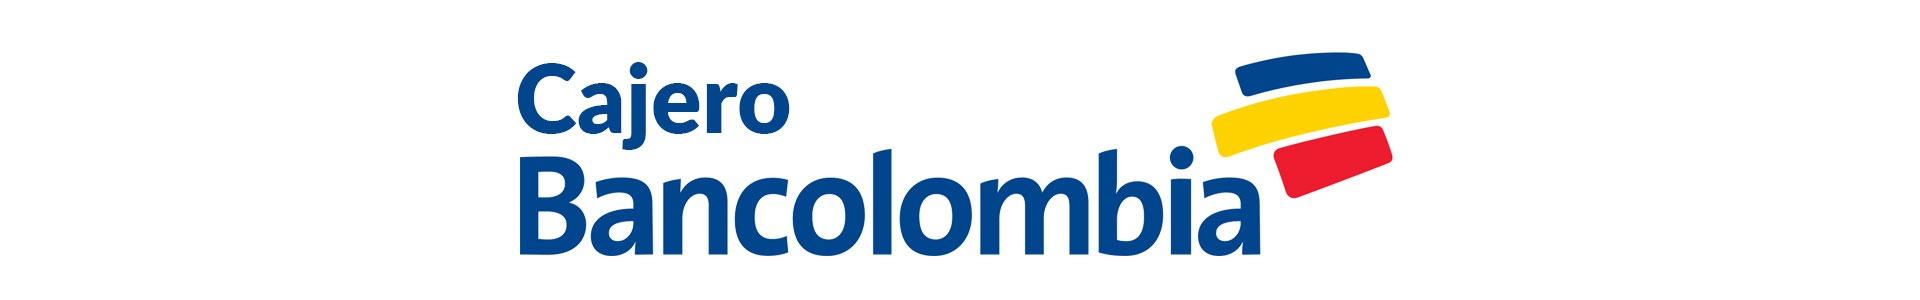 Cajero-Bancolombia